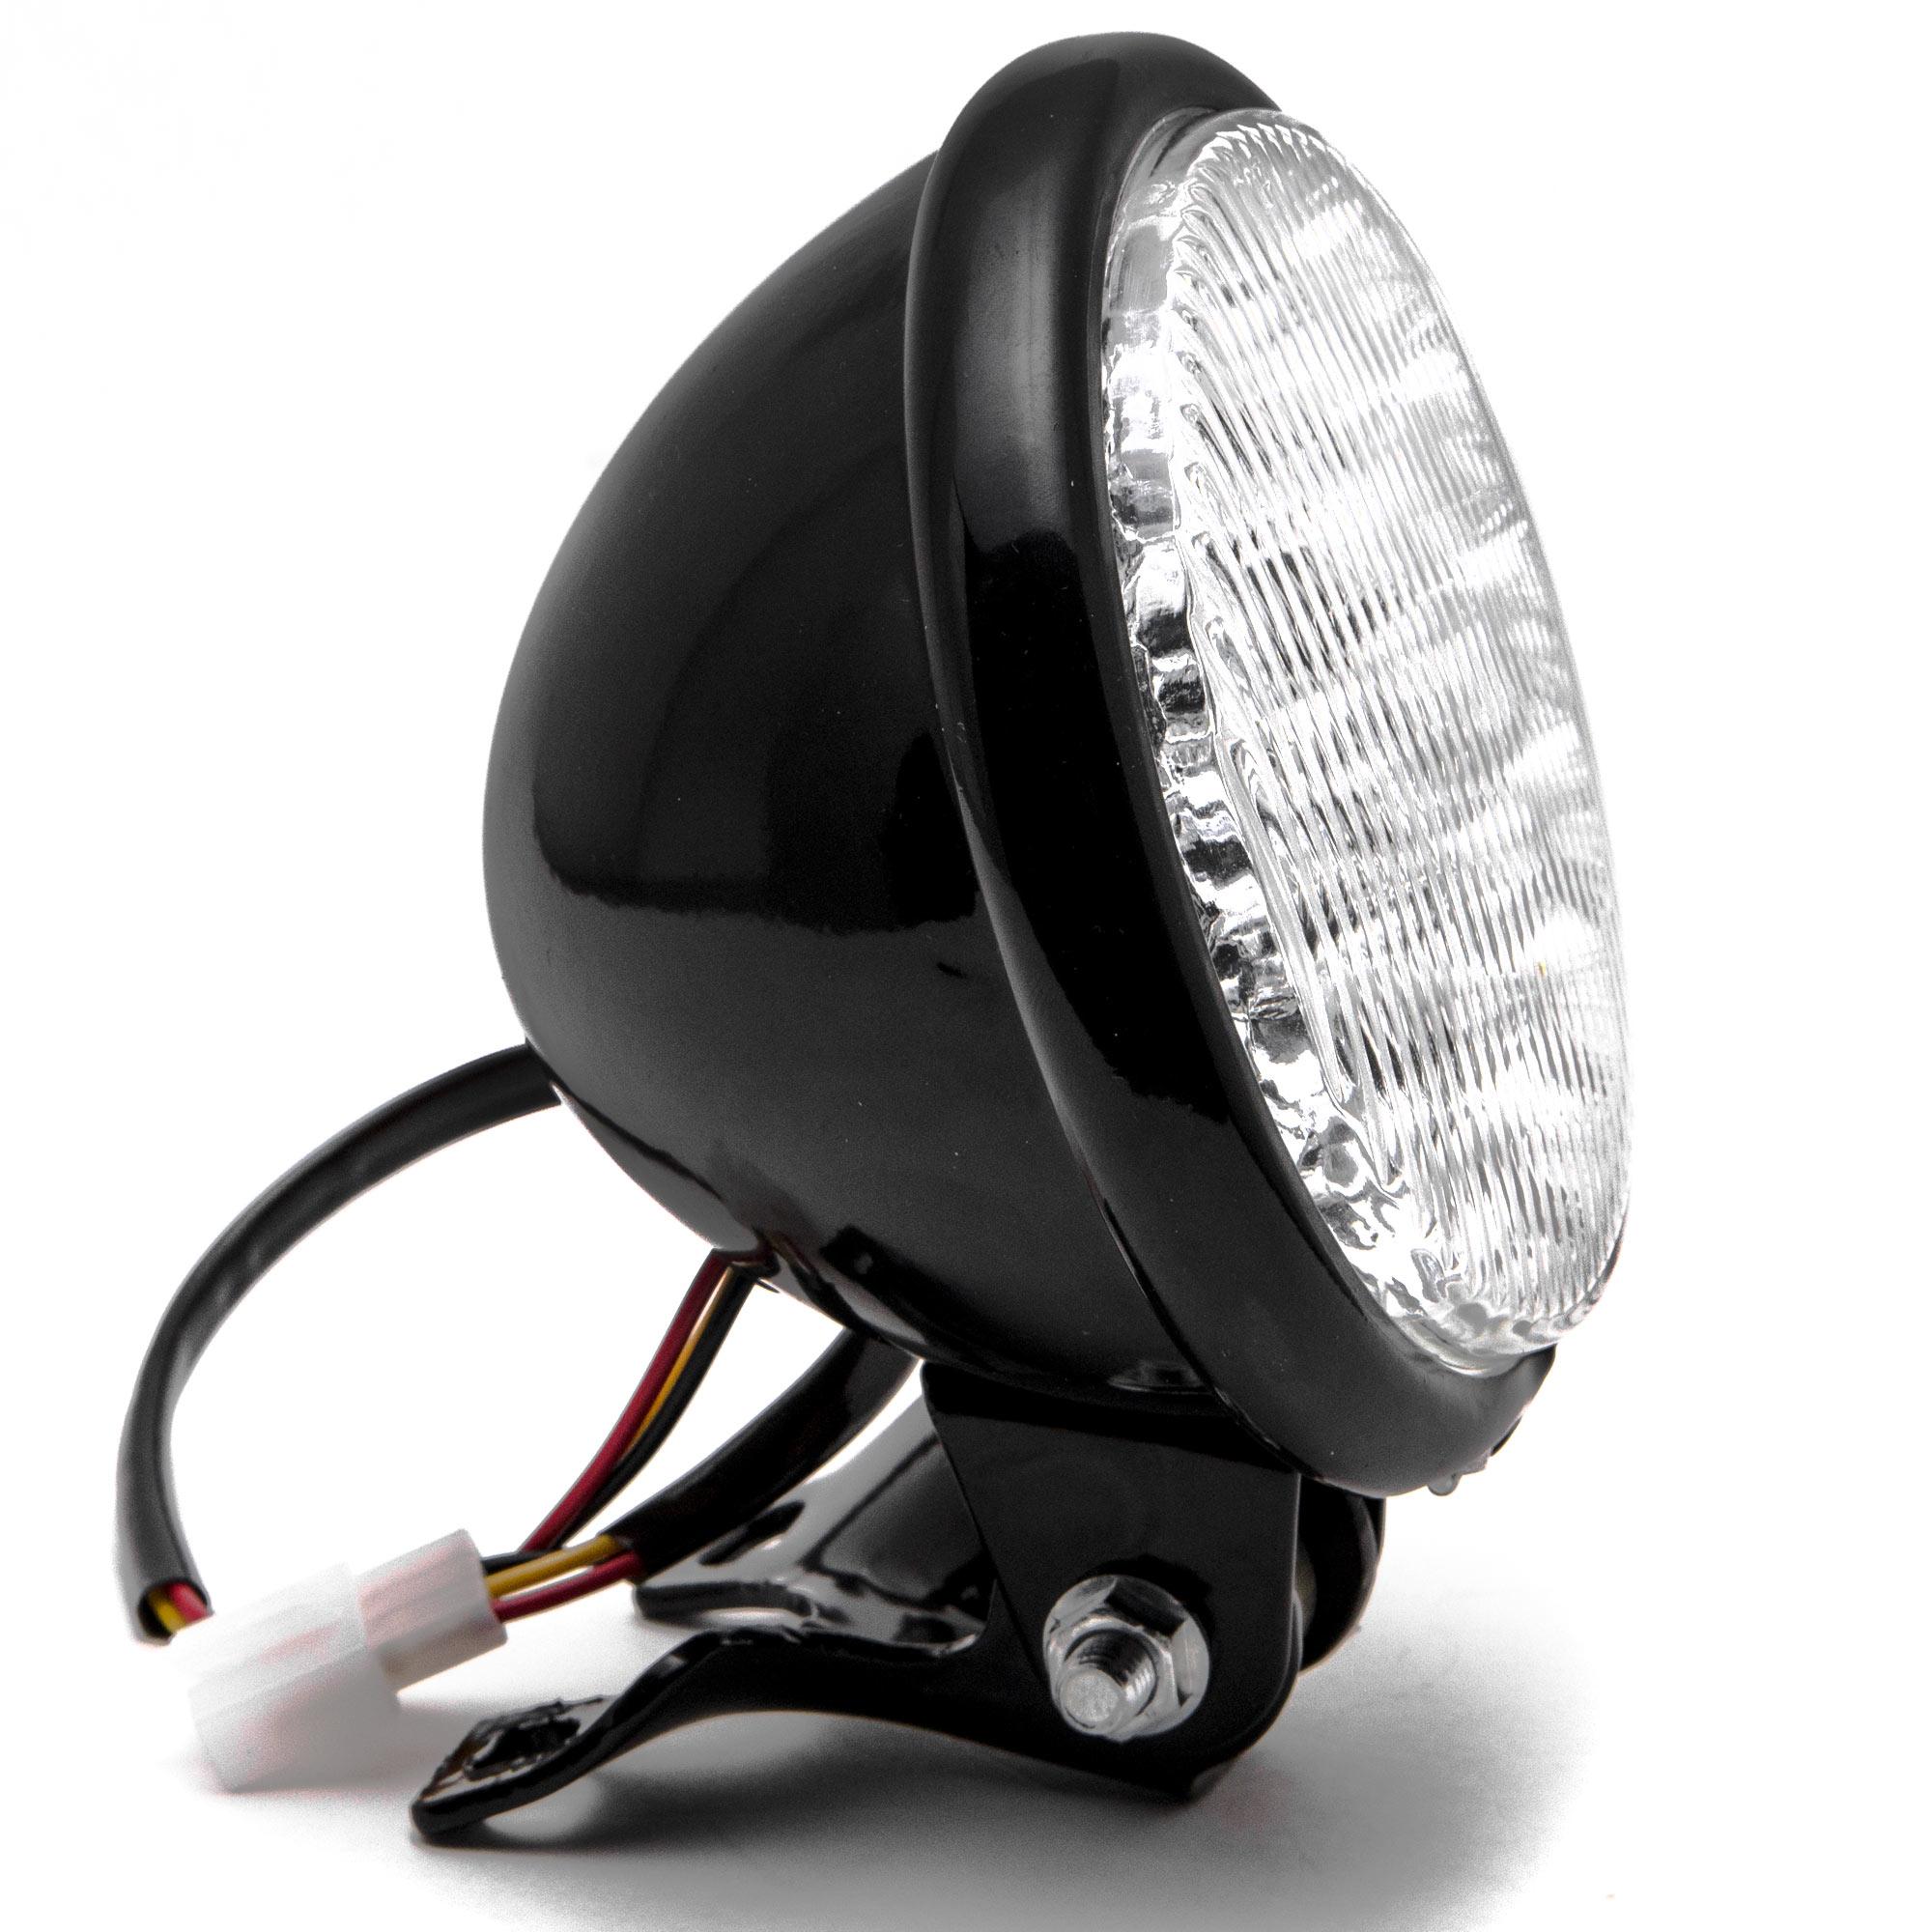 "Krator 5"" Black LED Headlight with Light Mounting Bracket for Suzuki Boulevard S40 S50 S83 - image 3 of 7"